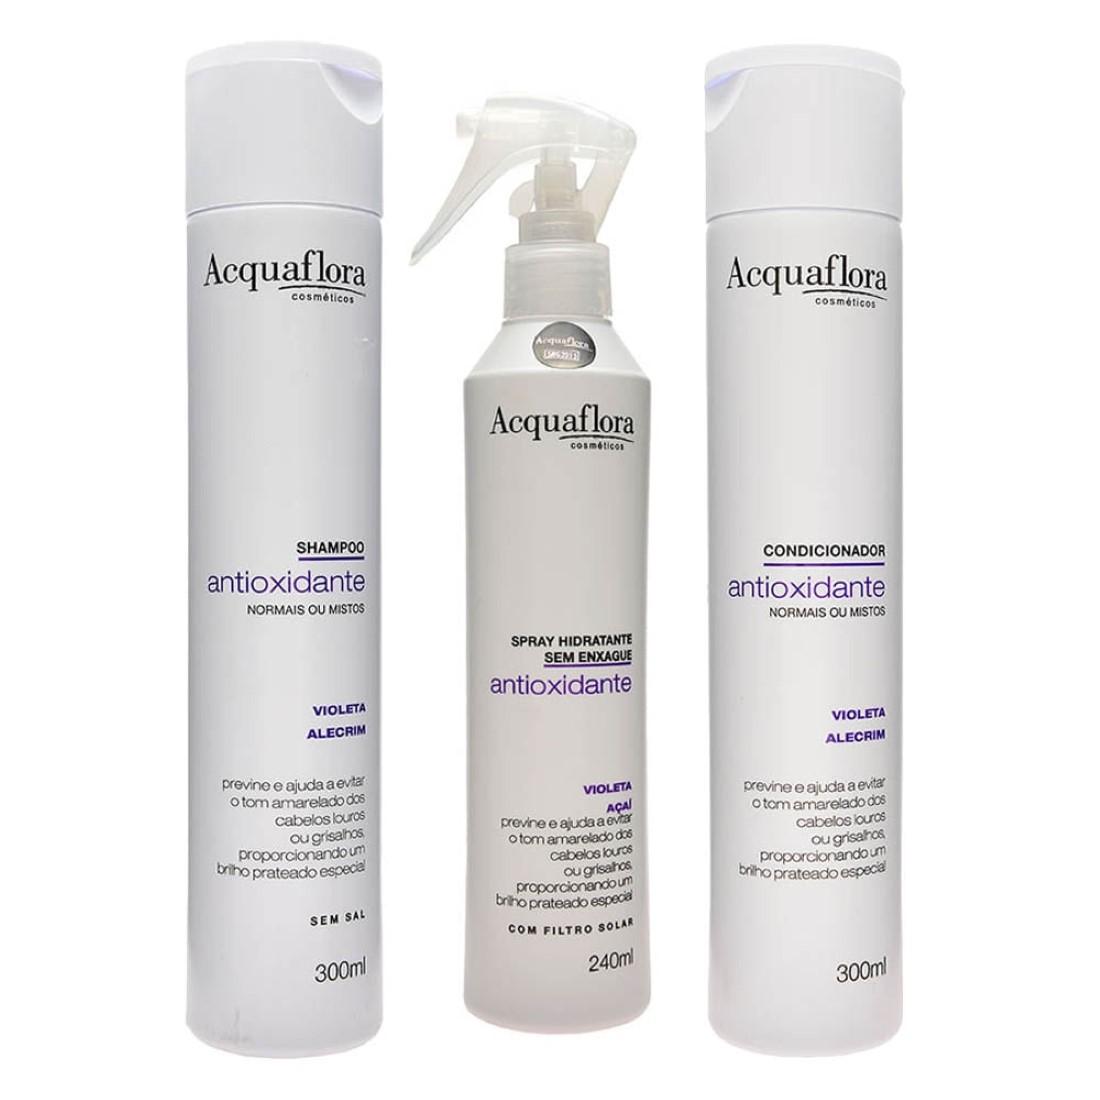 Kit Antioxidante Shampoo Condicionador Cabelos Normais e Mistos Spray - Acquaflora